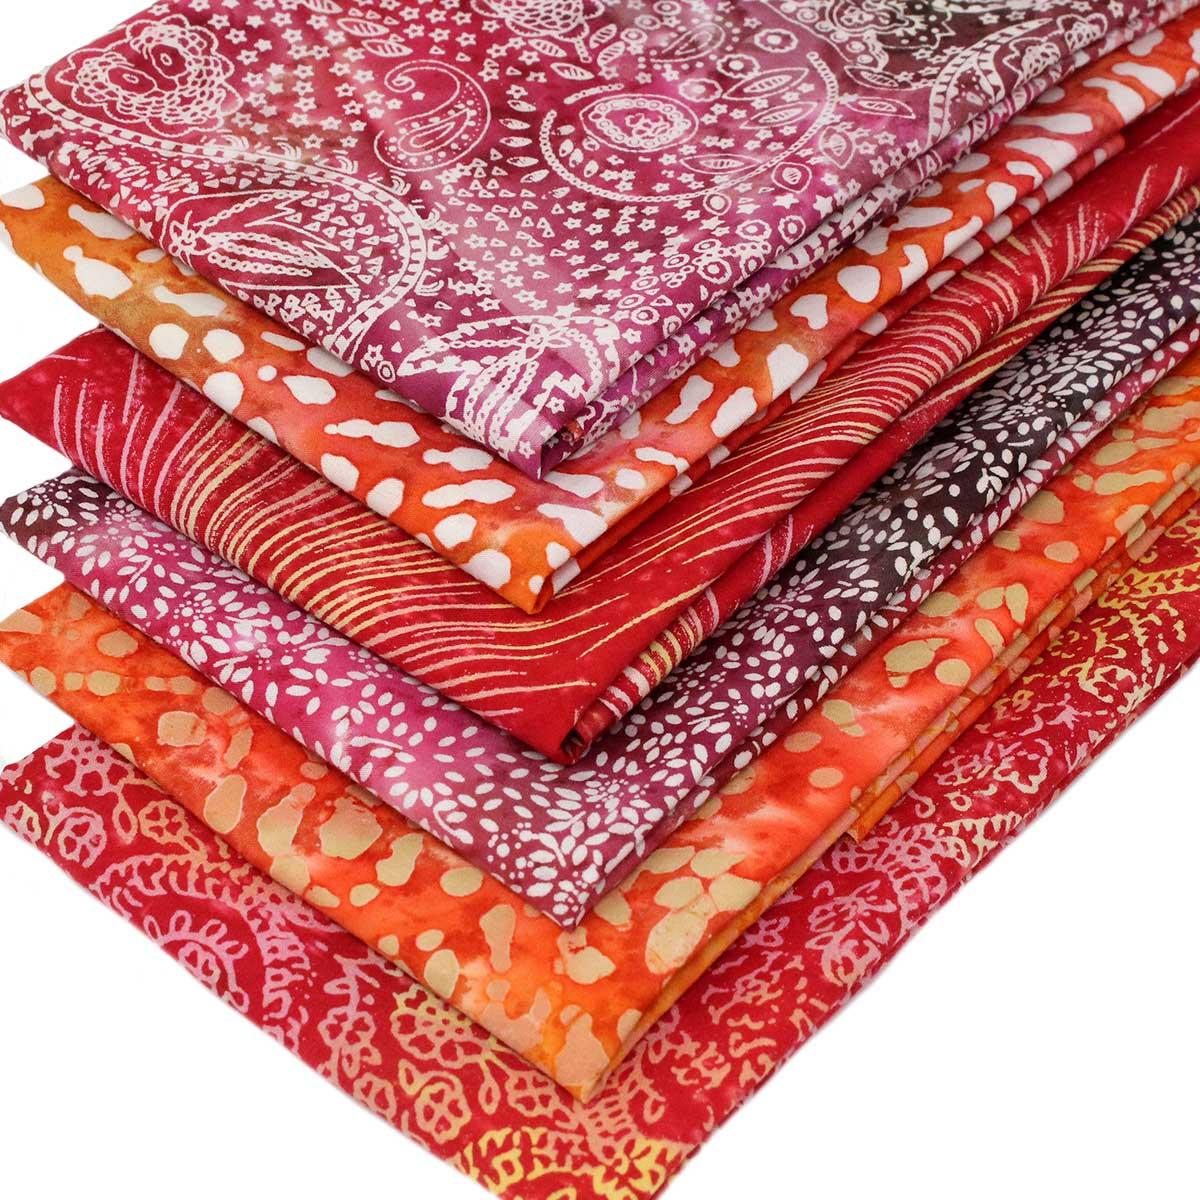 6 Fat Quarters Batik Bundle